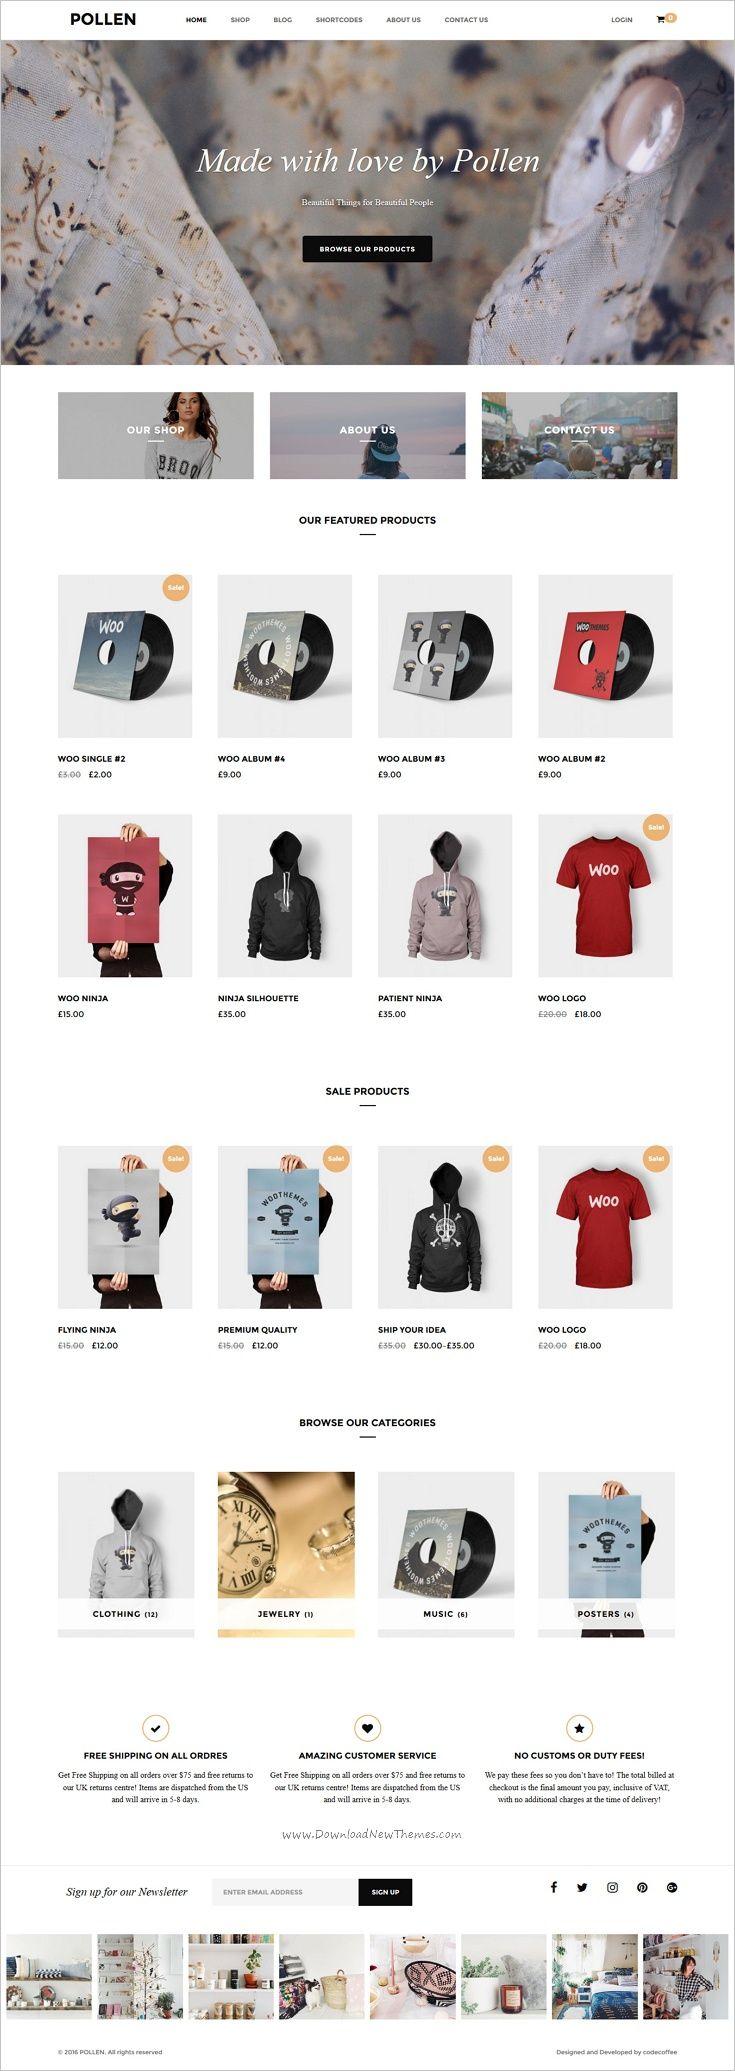 Pollen is a #minimalist responsive #WordPress theme for online #shop eCommerce website download now➩   https://themeforest.net/item/pollen-responsive-ecommerce-wordpress-theme/18133929?ref=Datasata